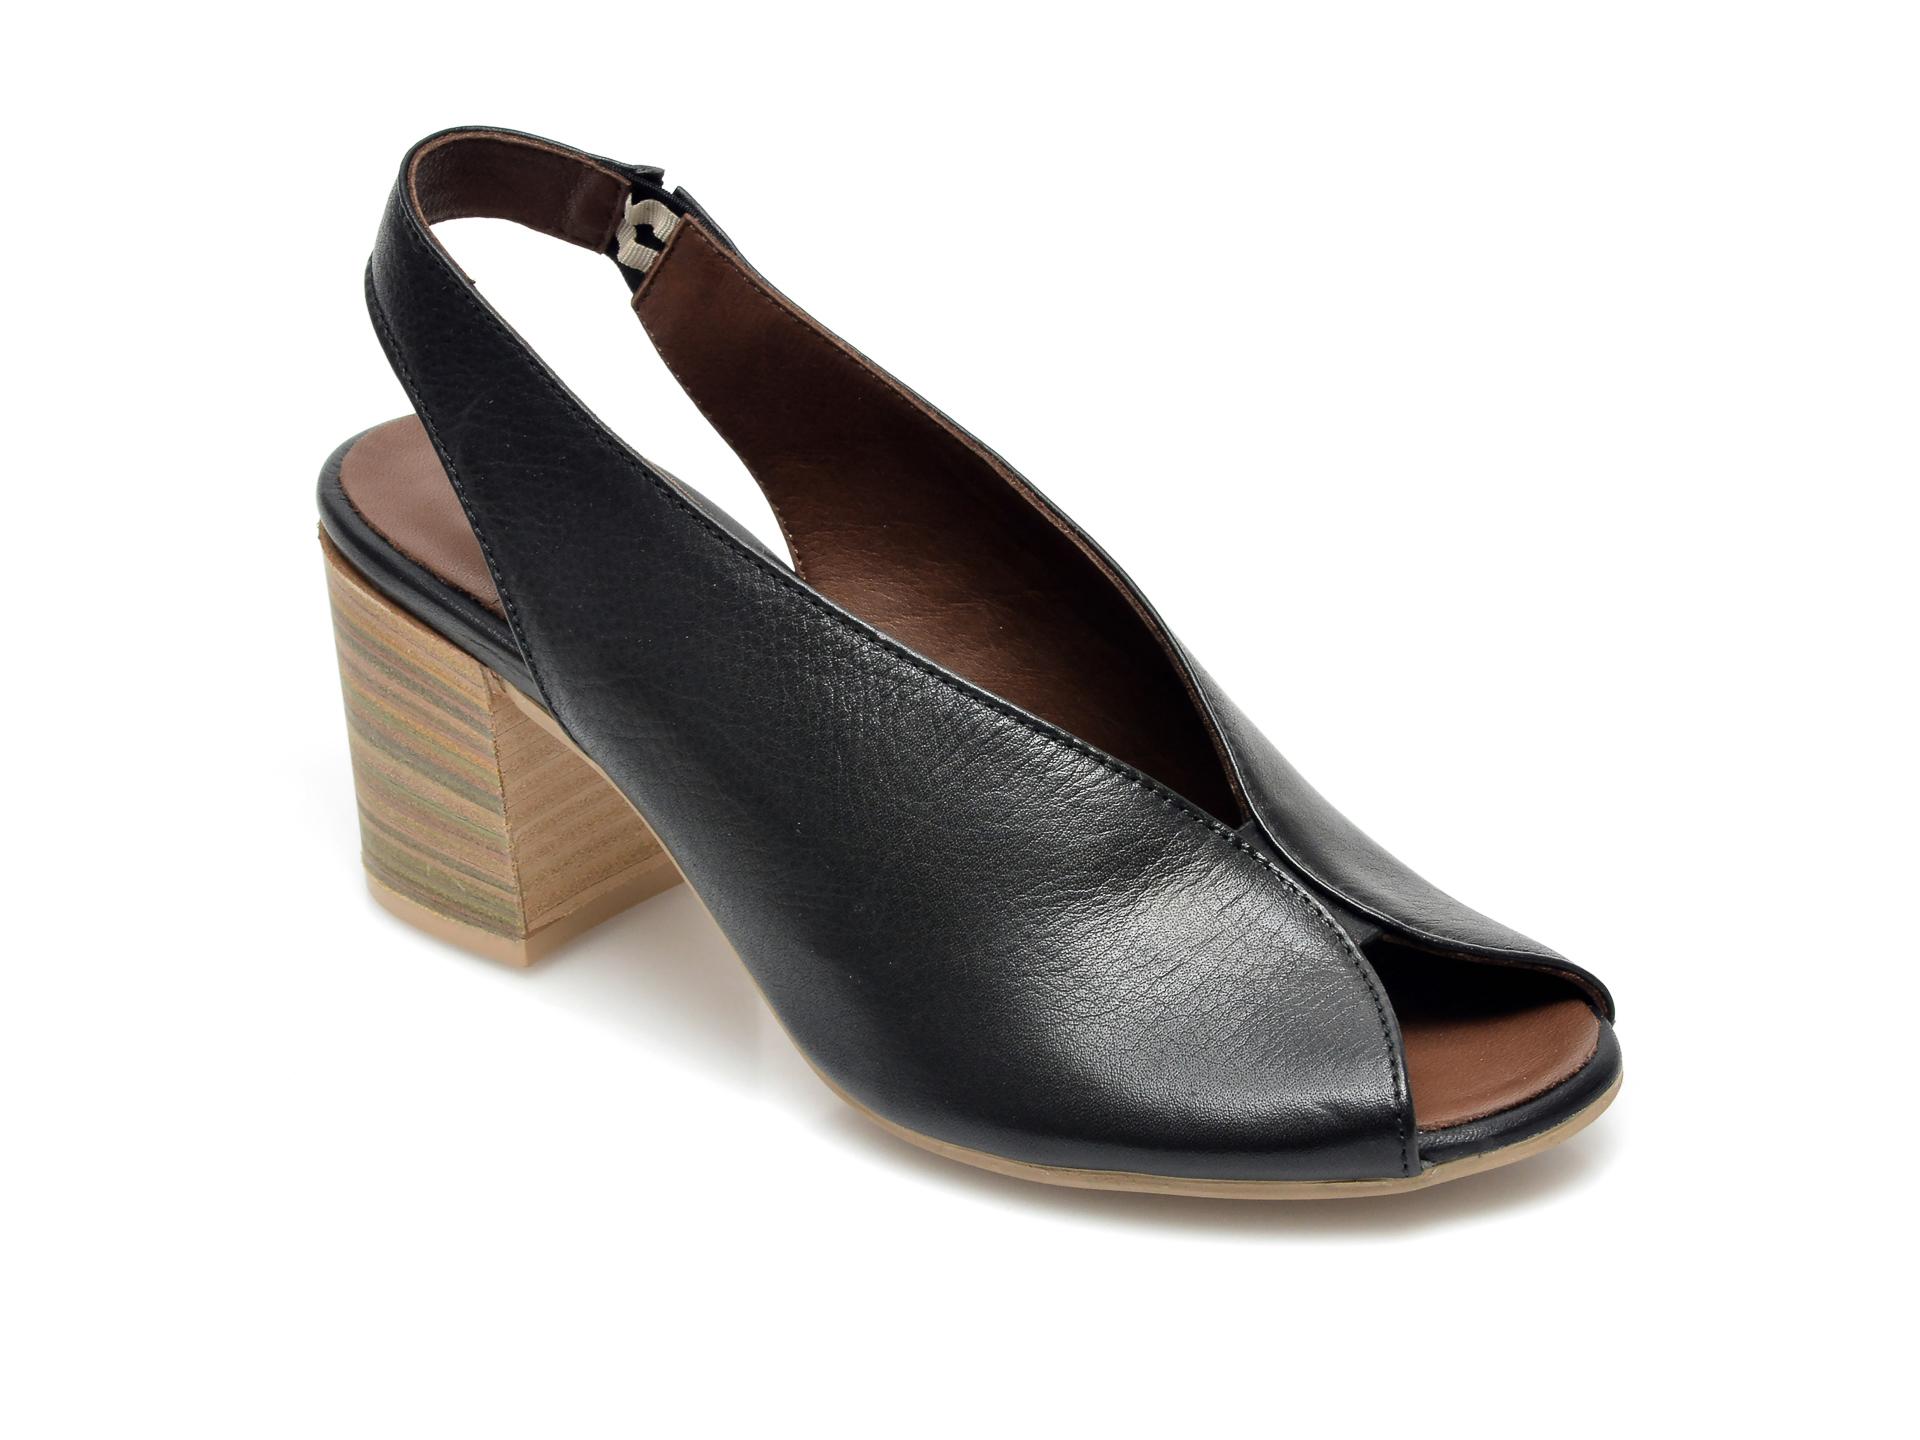 Sandale BABOOS negre, 1806, din piele naturala imagine otter.ro 2021